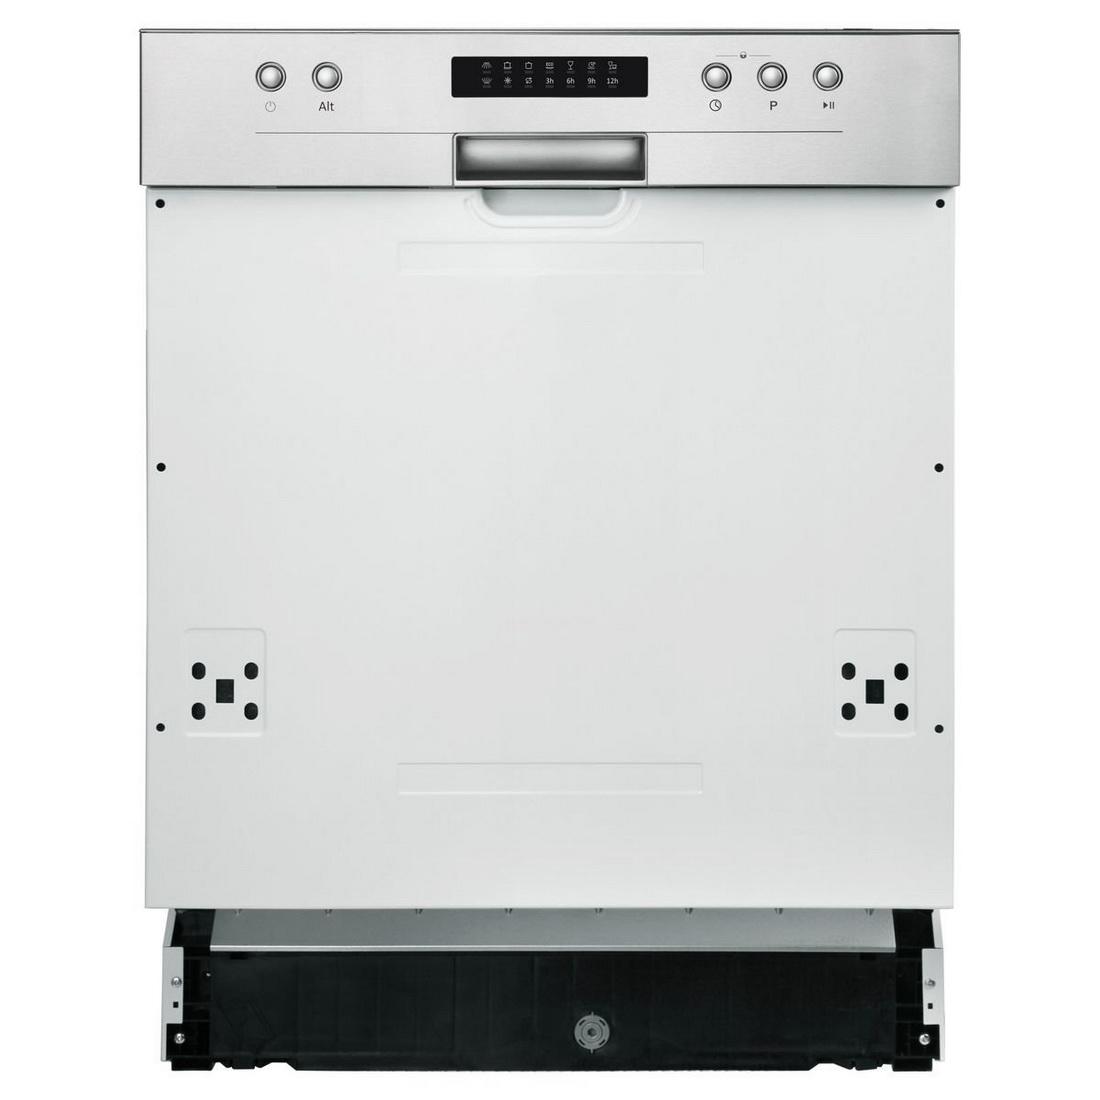 Semi Integrated Dishwasher 12 Place Settings 6 Wash Programs ADWSI601X